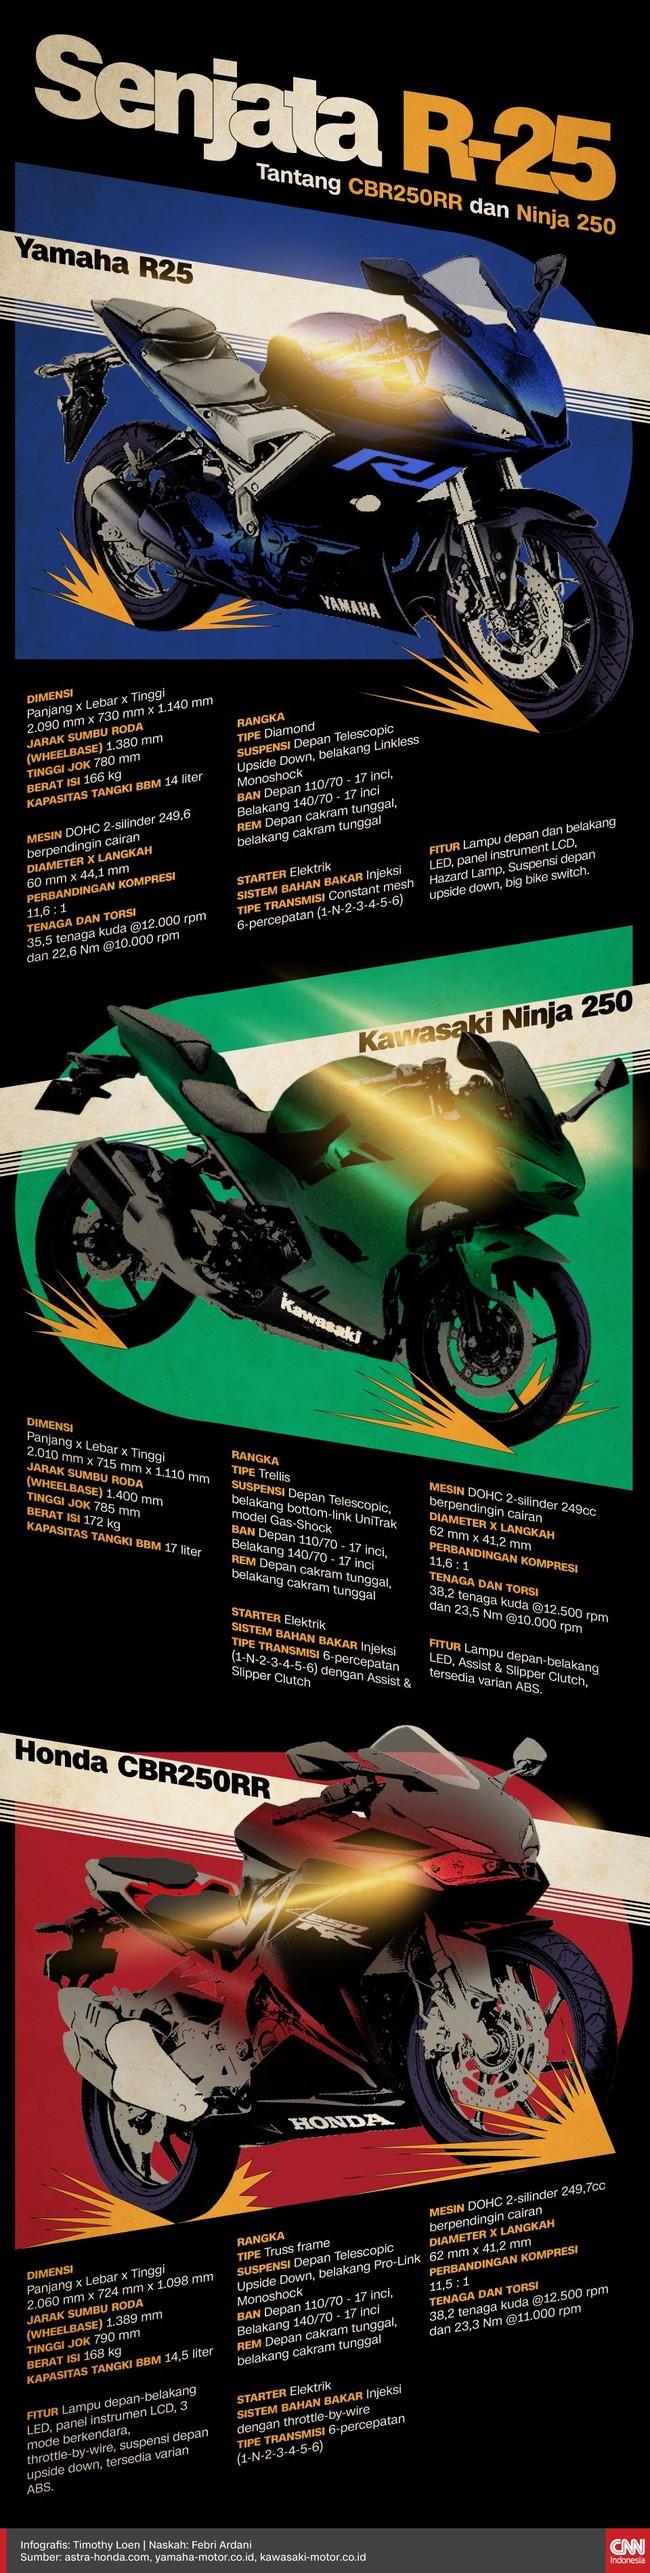 INFOGRAFIS: Senjata R25 Tantang CBR250RR dan Ninja 250